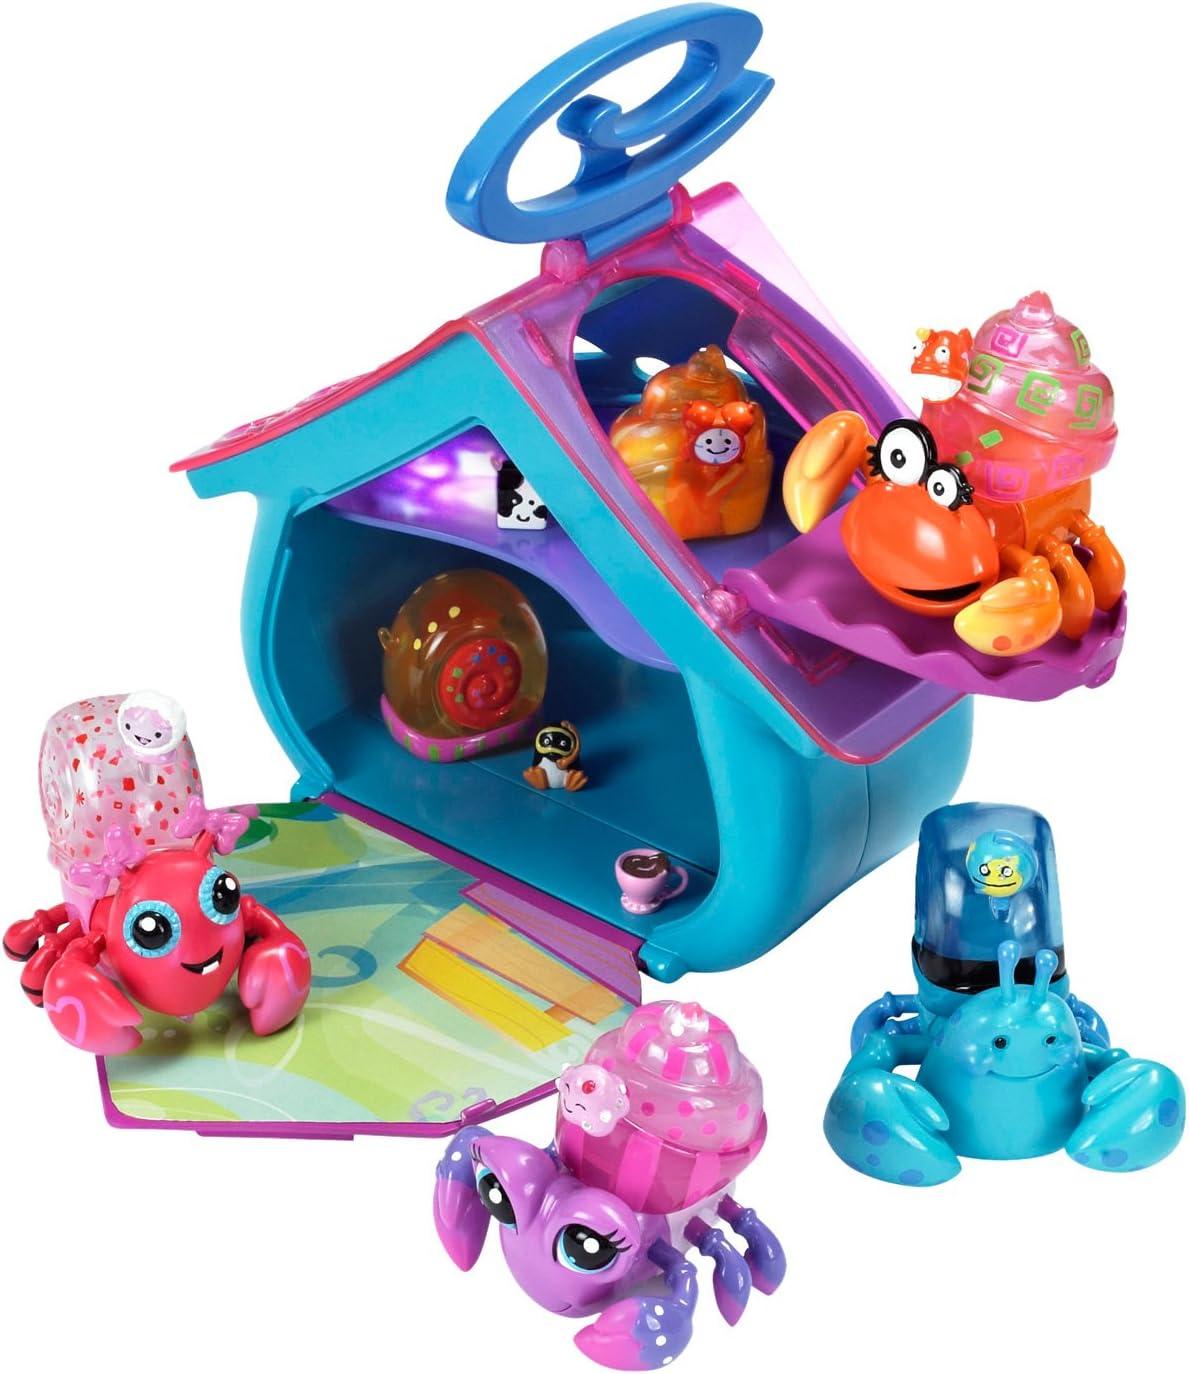 Character Options Xia Xia Confetti Cottage: Amazon.es: Juguetes y juegos